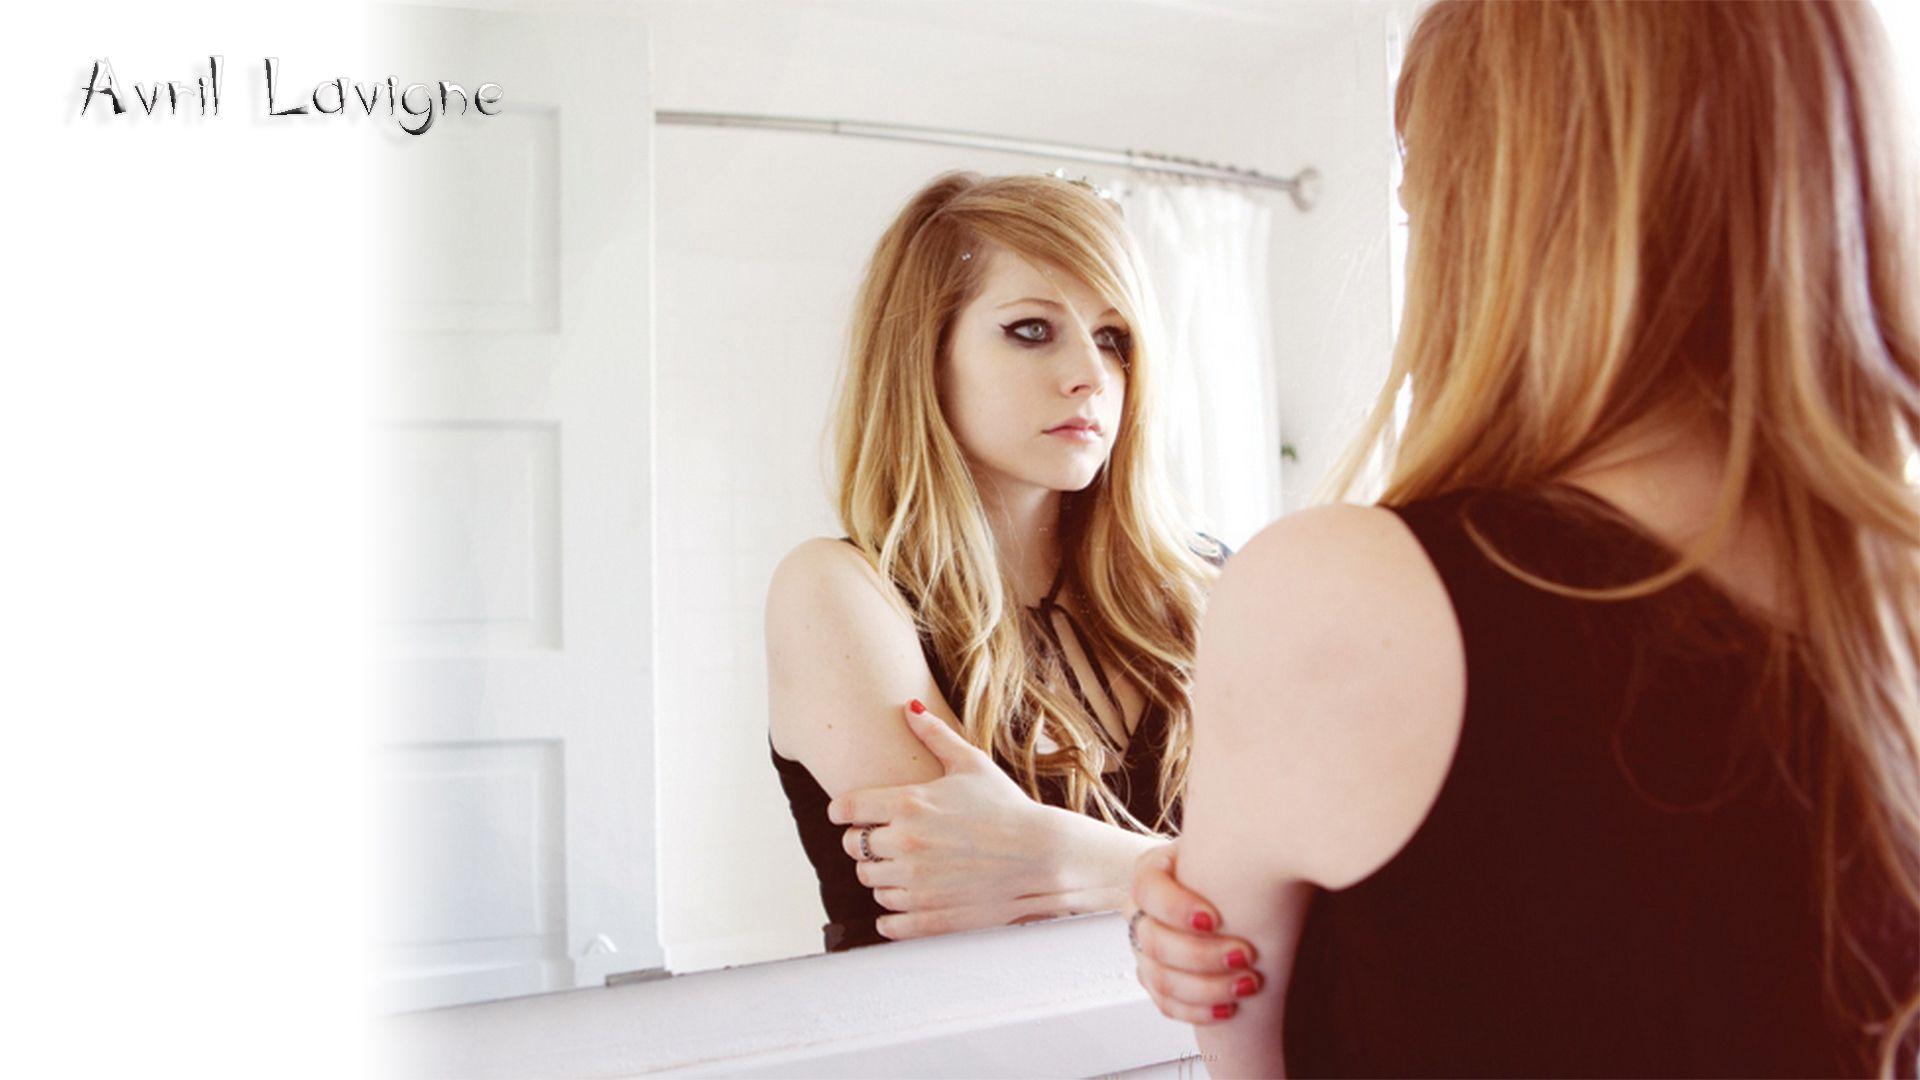 Avril Lavigne Wallpapers Wallpaper